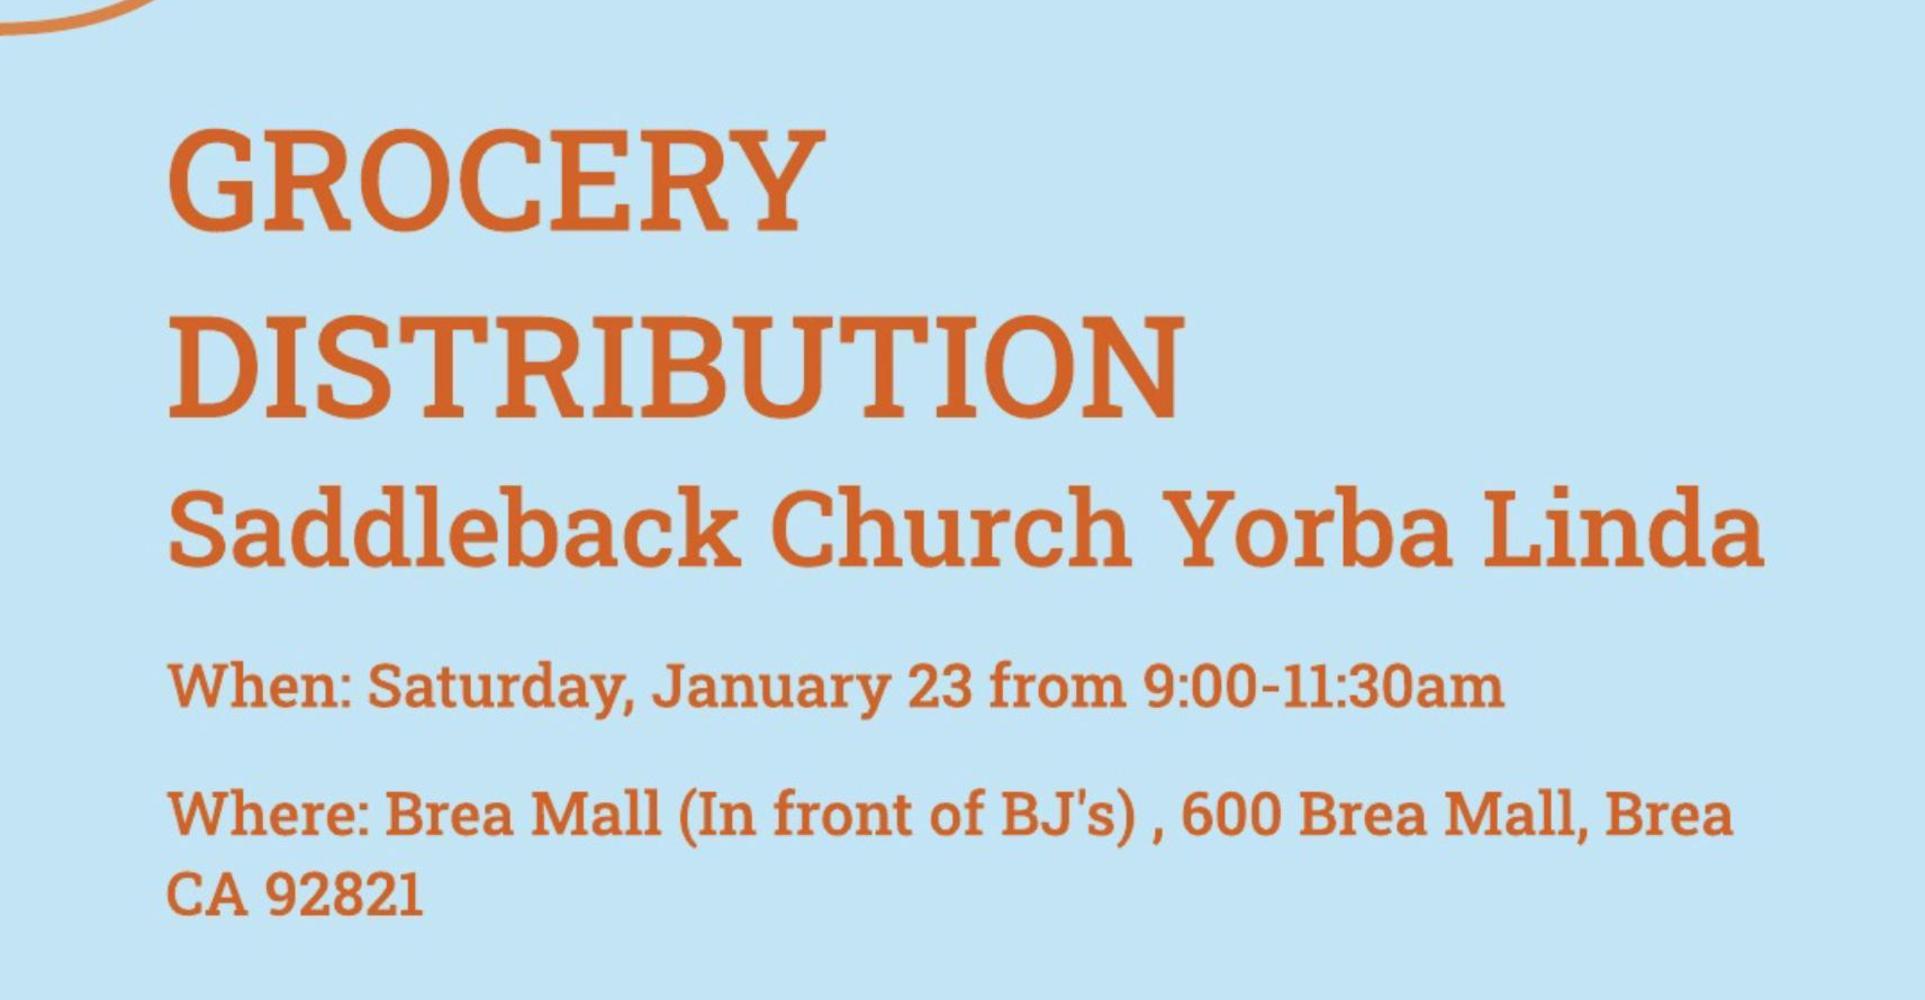 Grocery Distribution at Saddleback Church in Yorba Linda on January 23